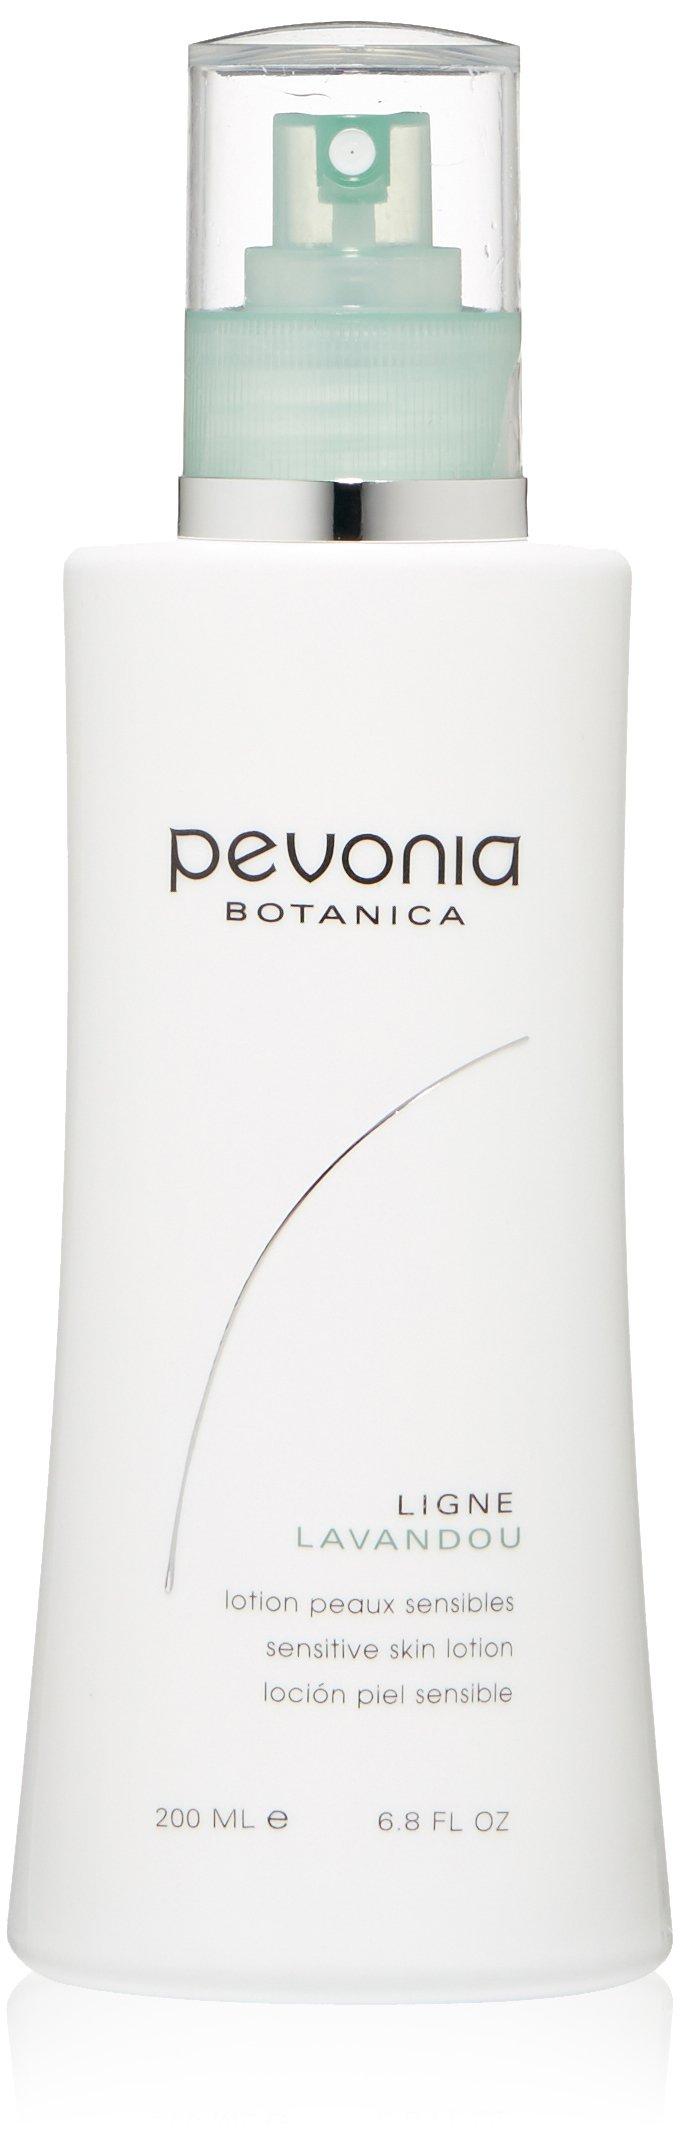 Pevonia Botanica - Sensitive Skin Cleanser - 200ml/6.9oz Pro 3MHz Ultrasound Ultrasonic Freckles Remover Anti Aging Skin Rejuvenation Beauty Facial Skin Spa Salon Machine